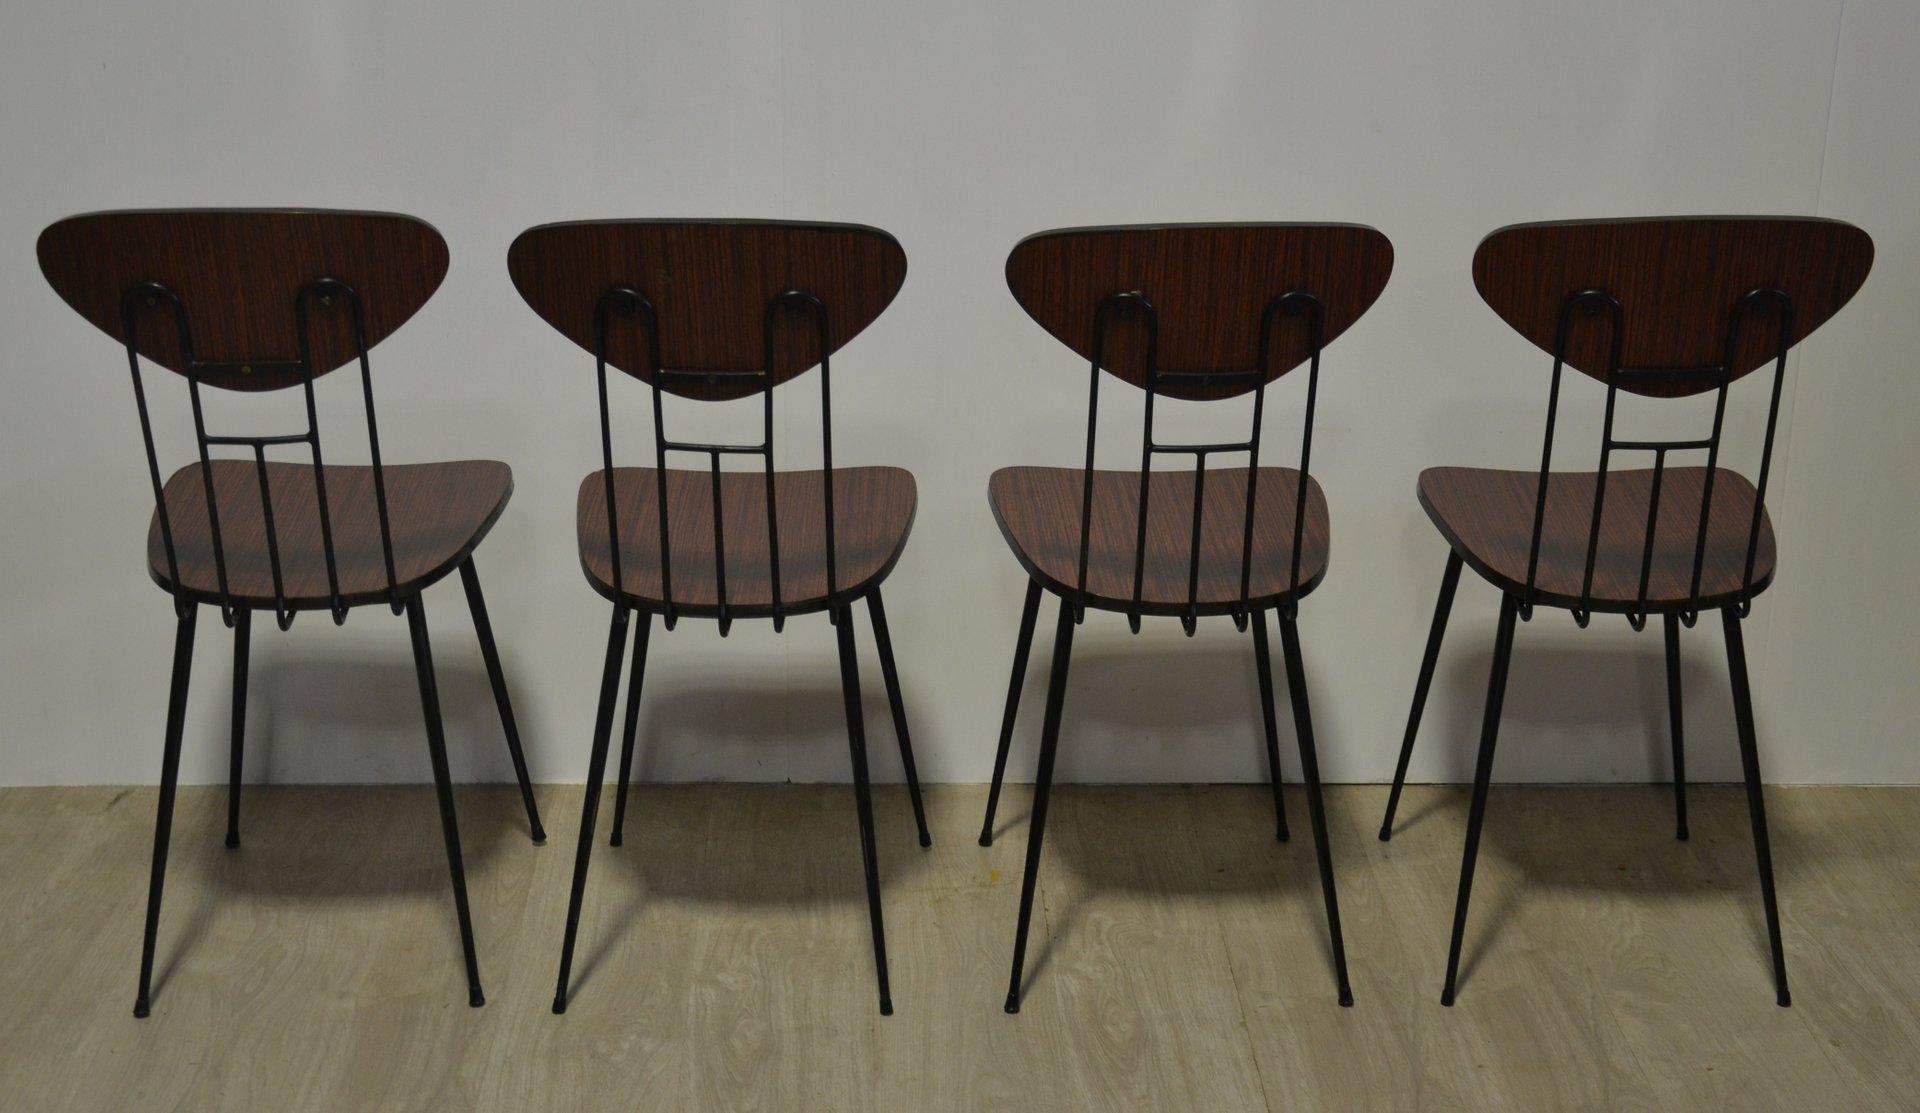 Sedie Vintage Colorate : Sedia vintage ferro battuto sedie legno colorate vintage amazing